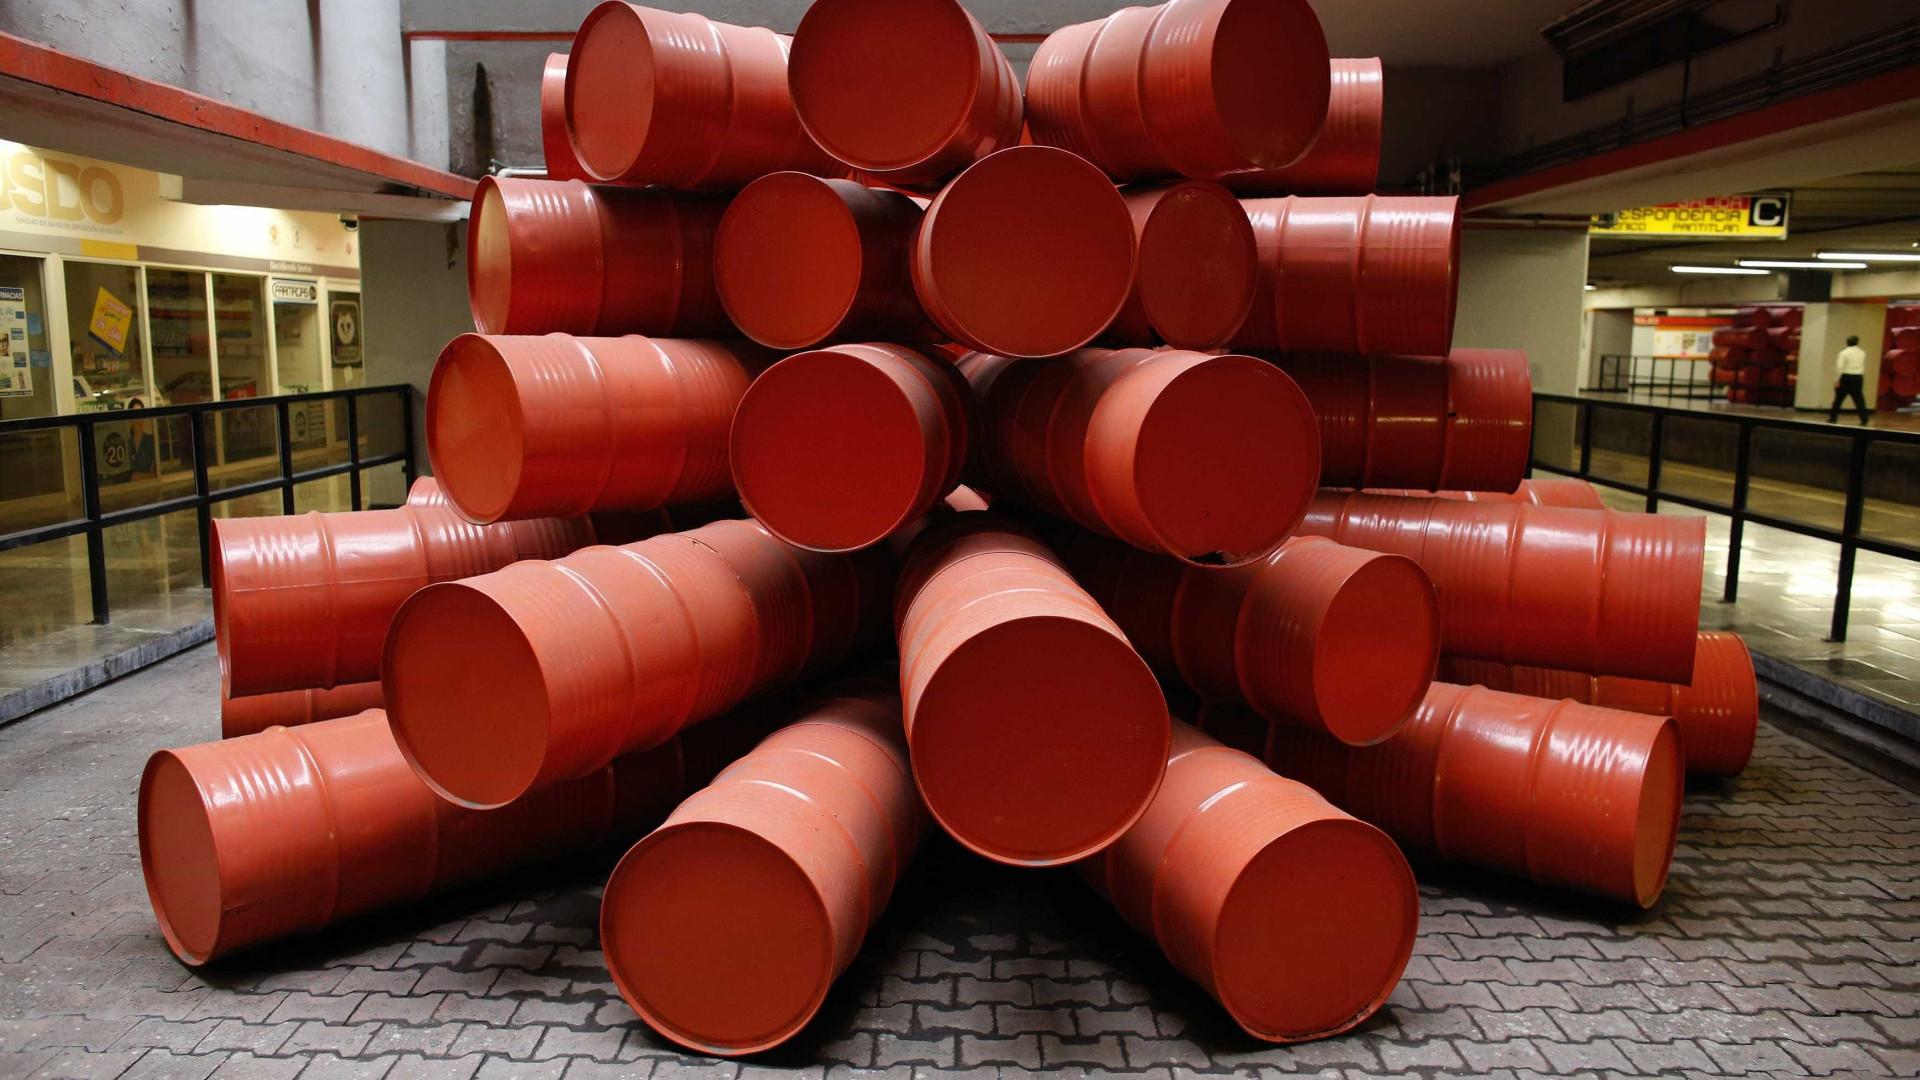 Preço do barril Brent sobe 2,21% para 53,61 dólares